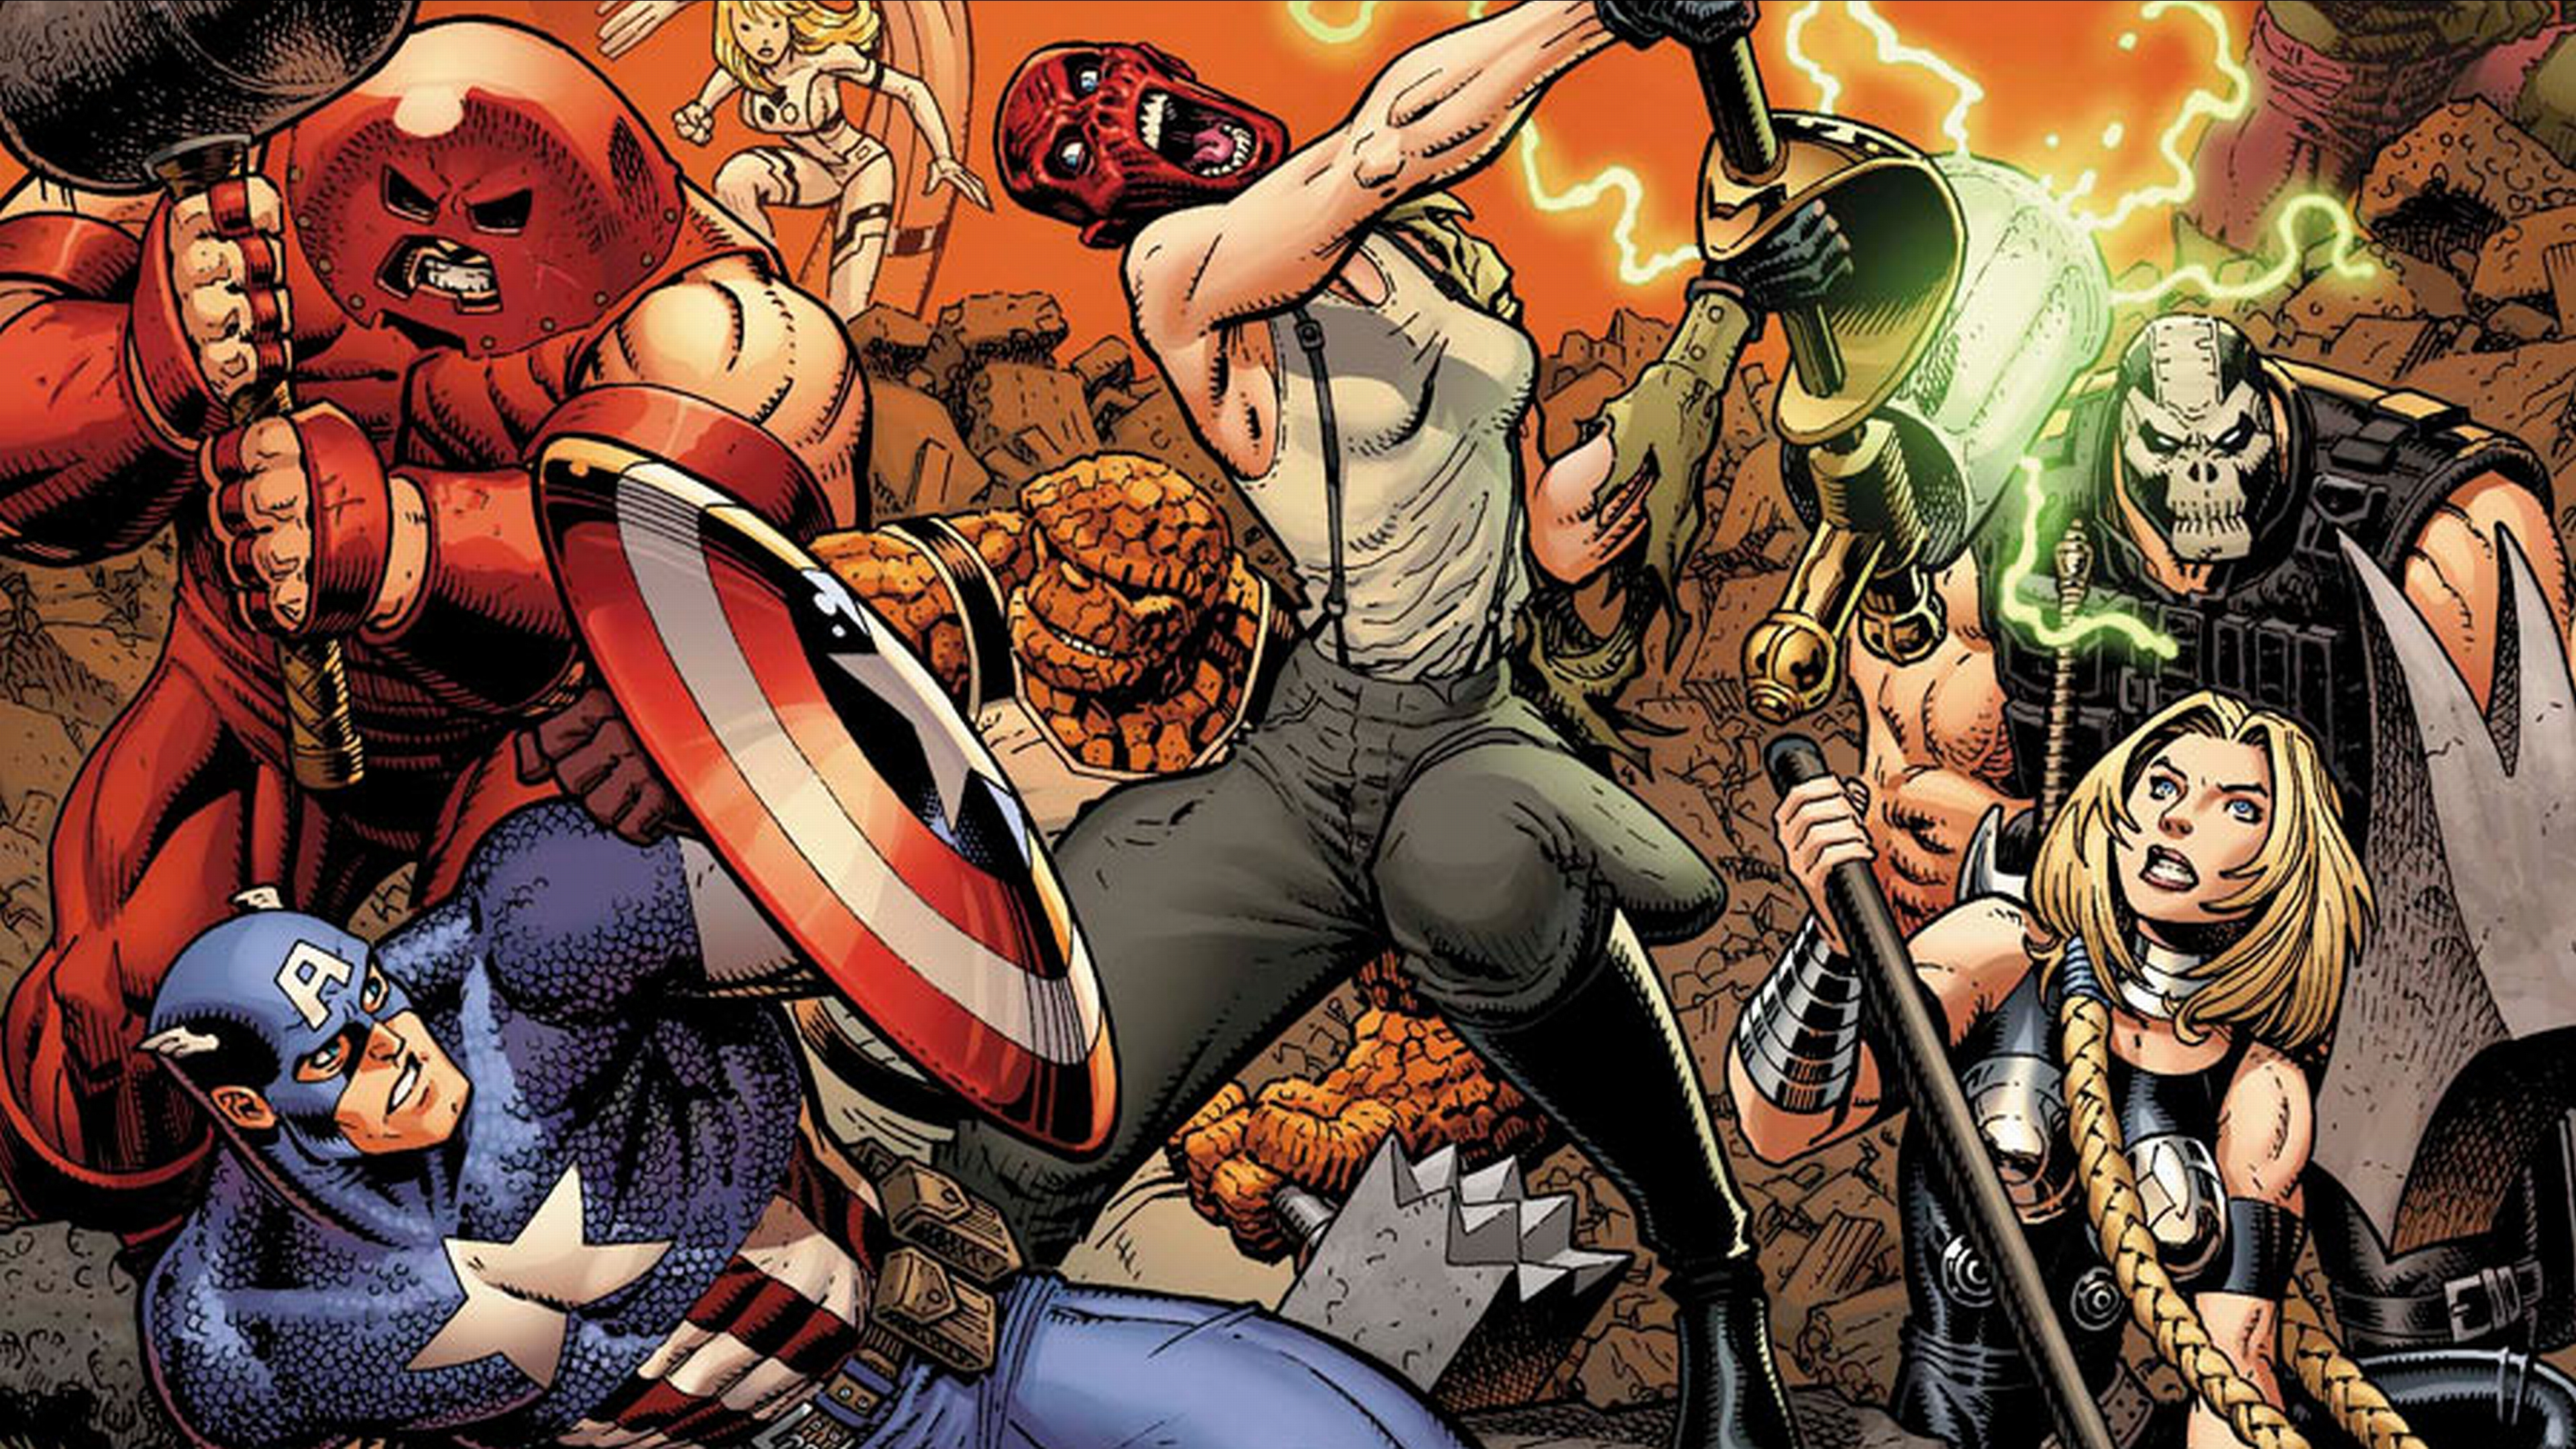 Most Inspiring Wallpaper Marvel Juggernaut - 160306  You Should Have_682886.jpg